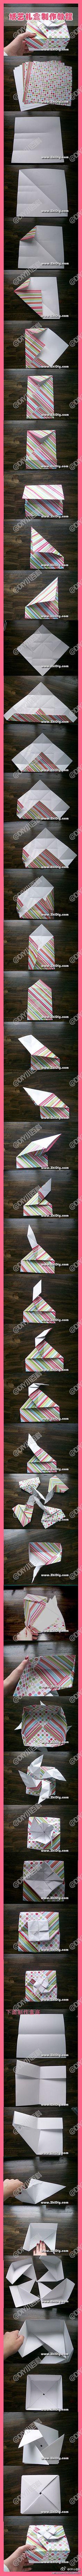 Paper gift box making tutorials